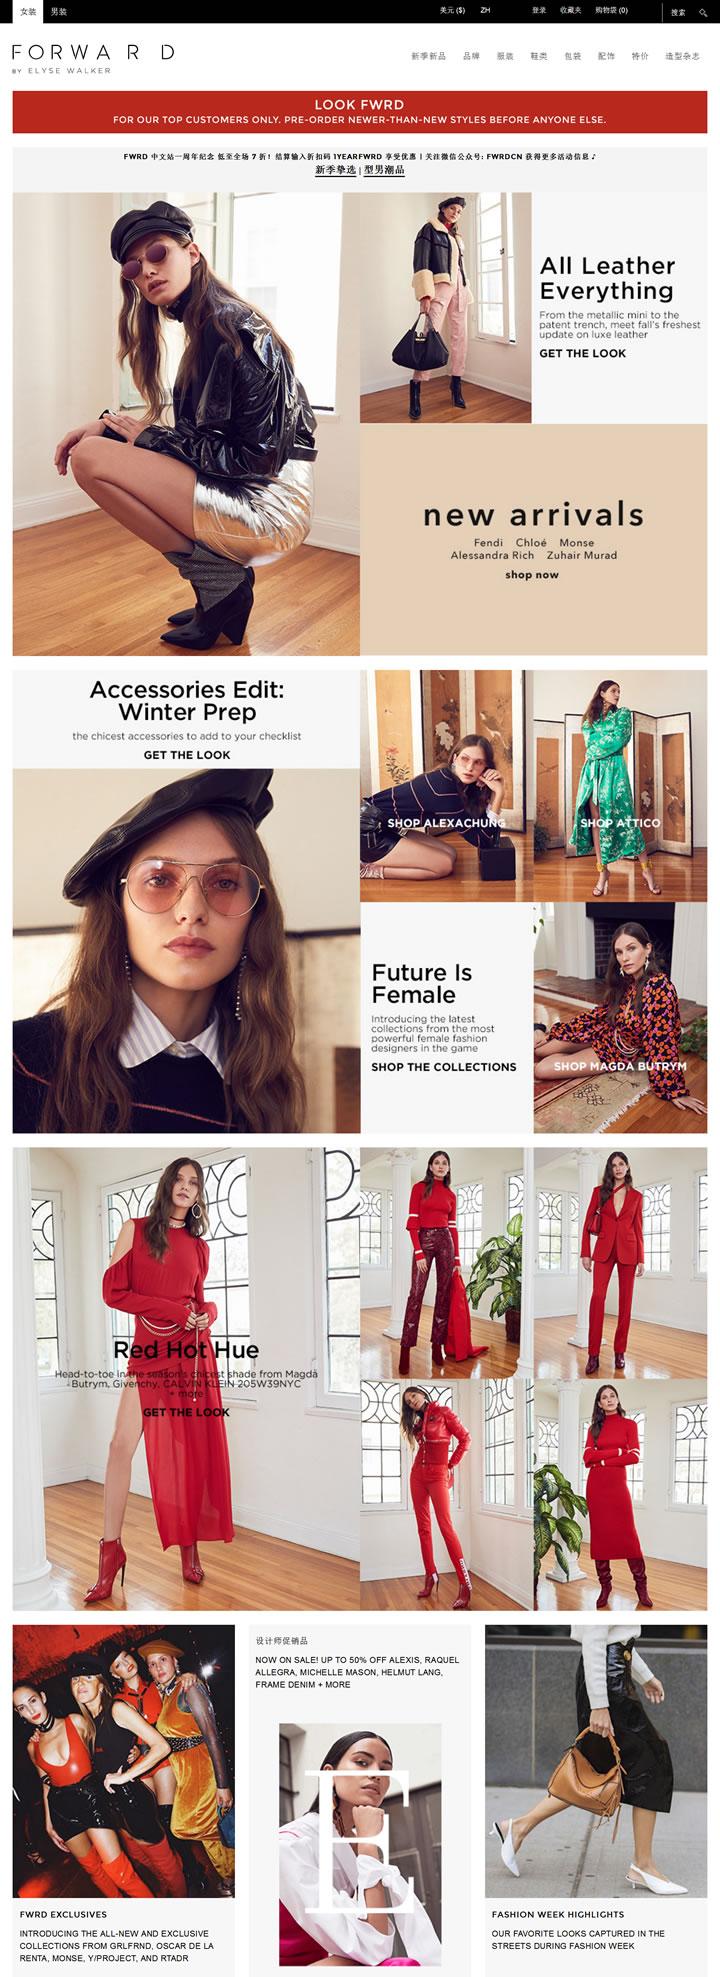 FWRD中文站:高档奢华时装在线目的地